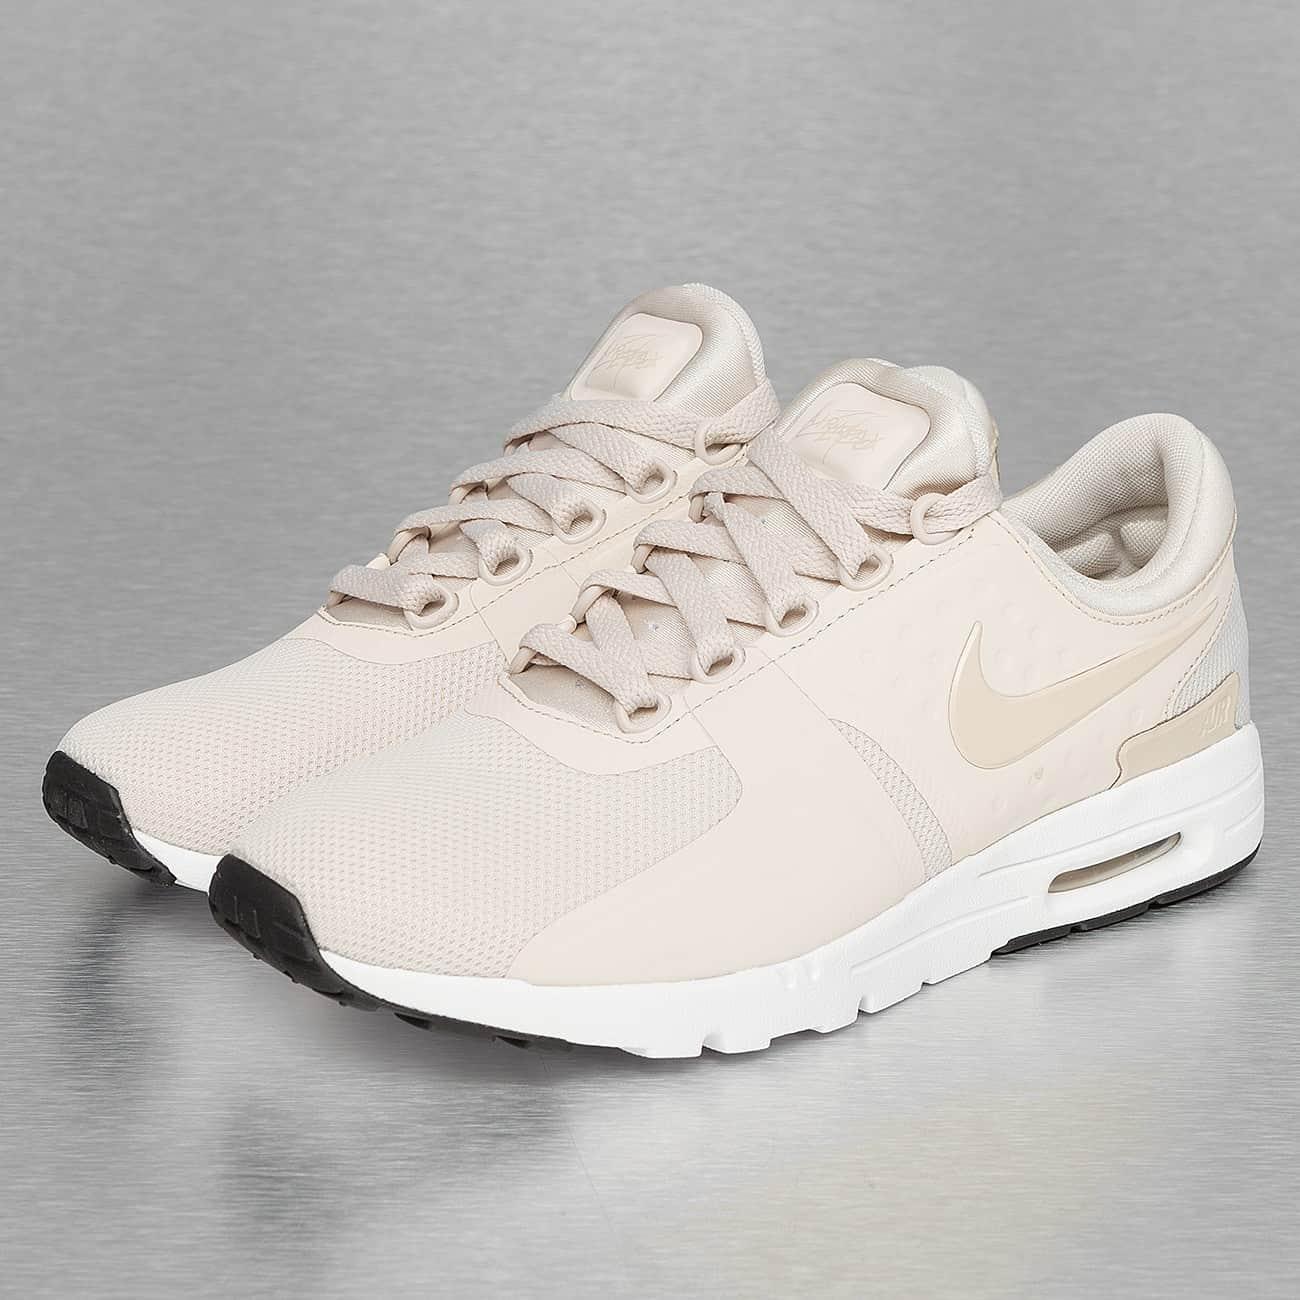 nike femmes chaussures beige